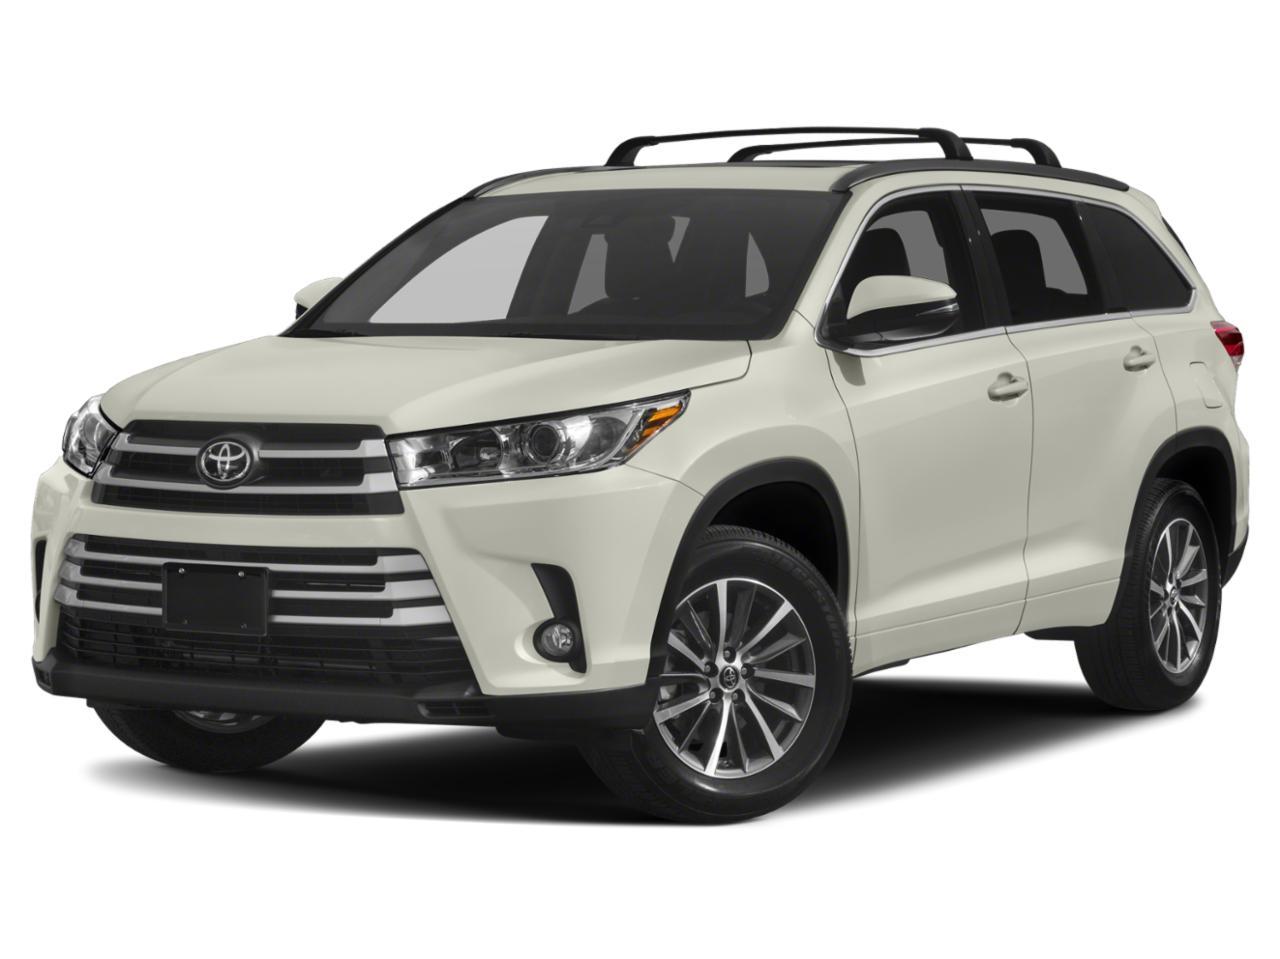 2018 Toyota Highlander Vehicle Photo in San Antonio, TX 78238